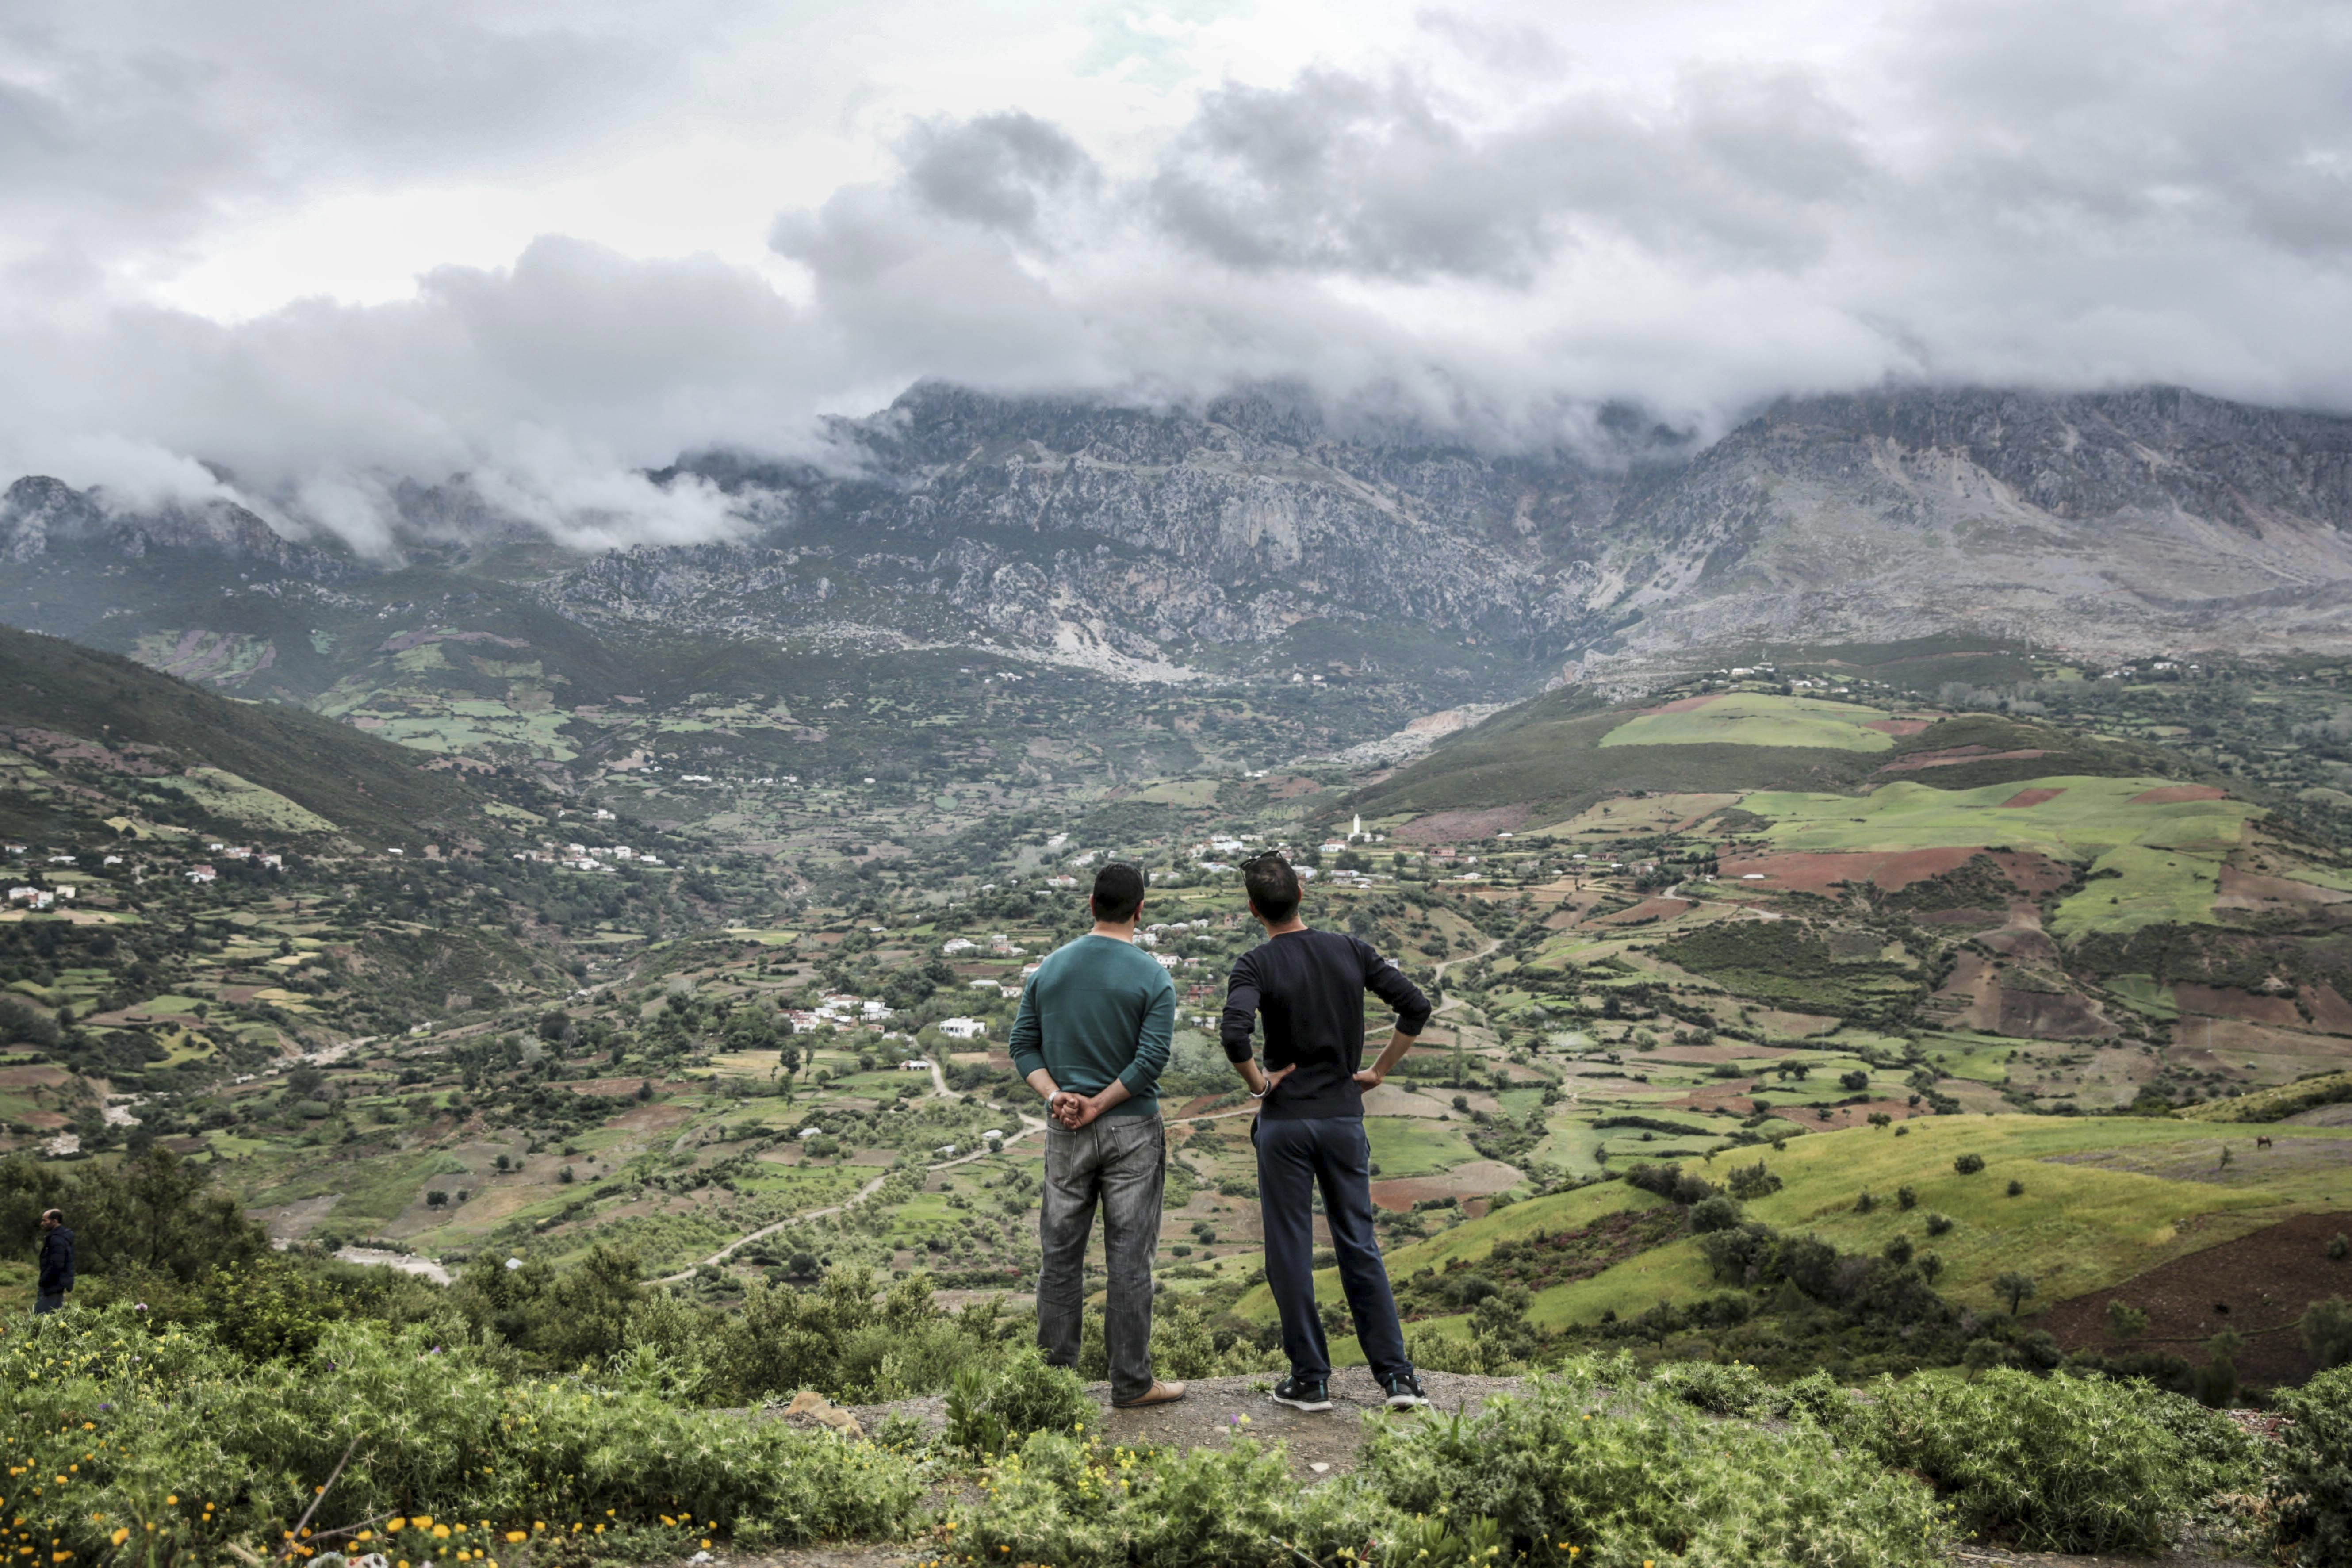 "<div class=""meta image-caption""><div class=""origin-logo origin-image ap""><span>AP</span></div><span class=""caption-text"">Two men observe rainclouds hanging over the Rif mountains near Tetouan, northern Morocco (AP)</span></div>"